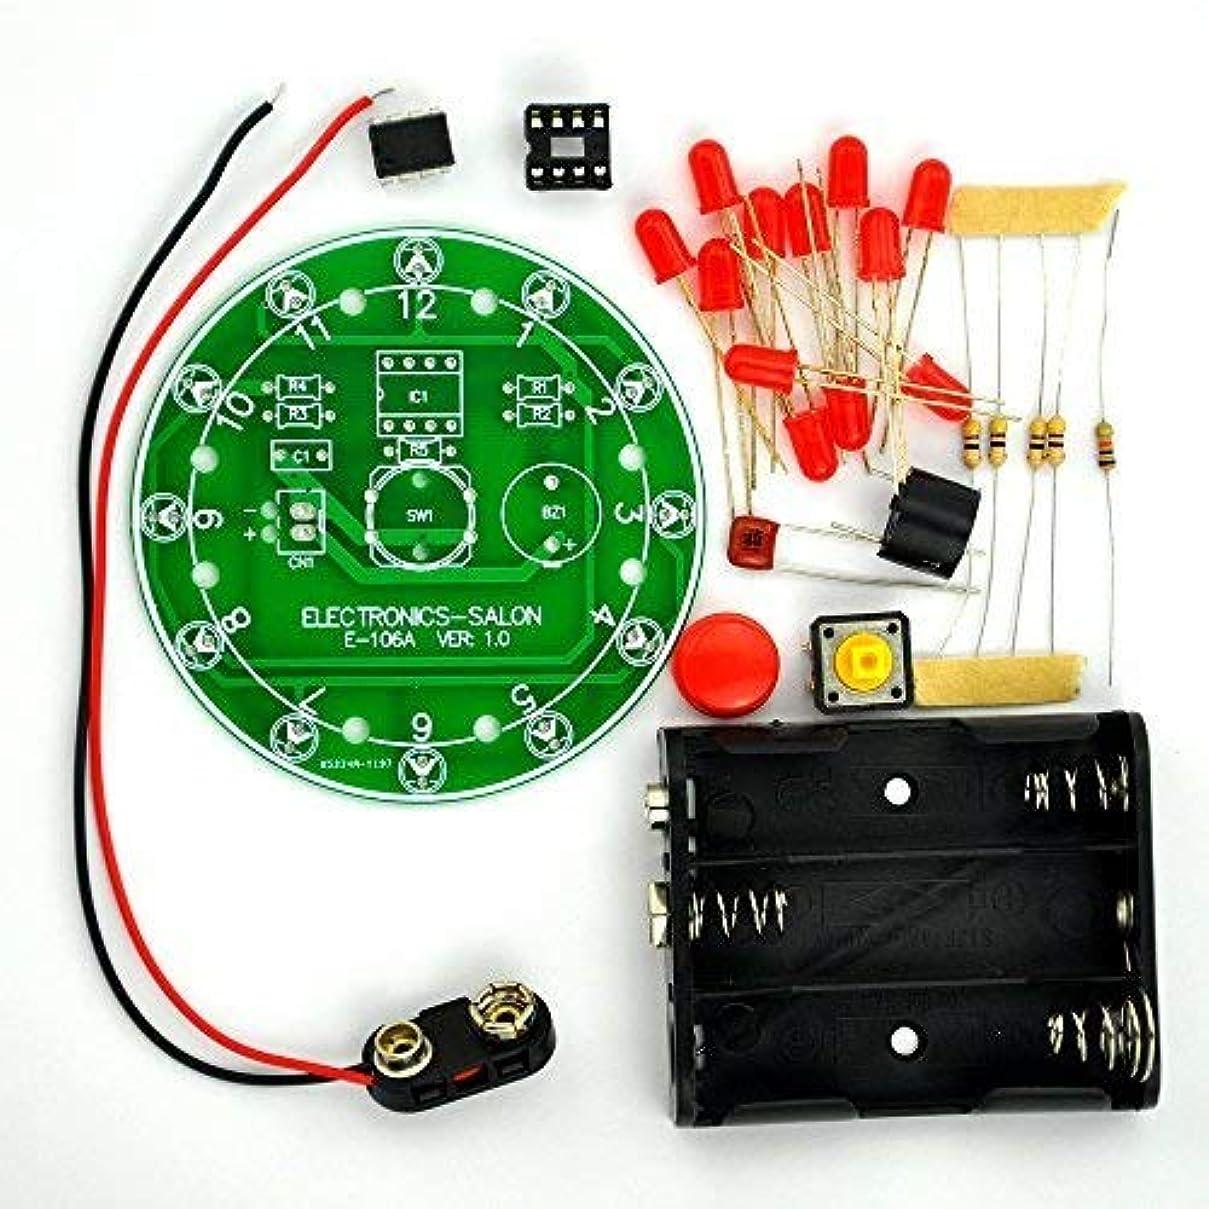 Electronics-Salon 12位置pic12f508 MCUに基づく電子ラッキー回転ボードキット導い